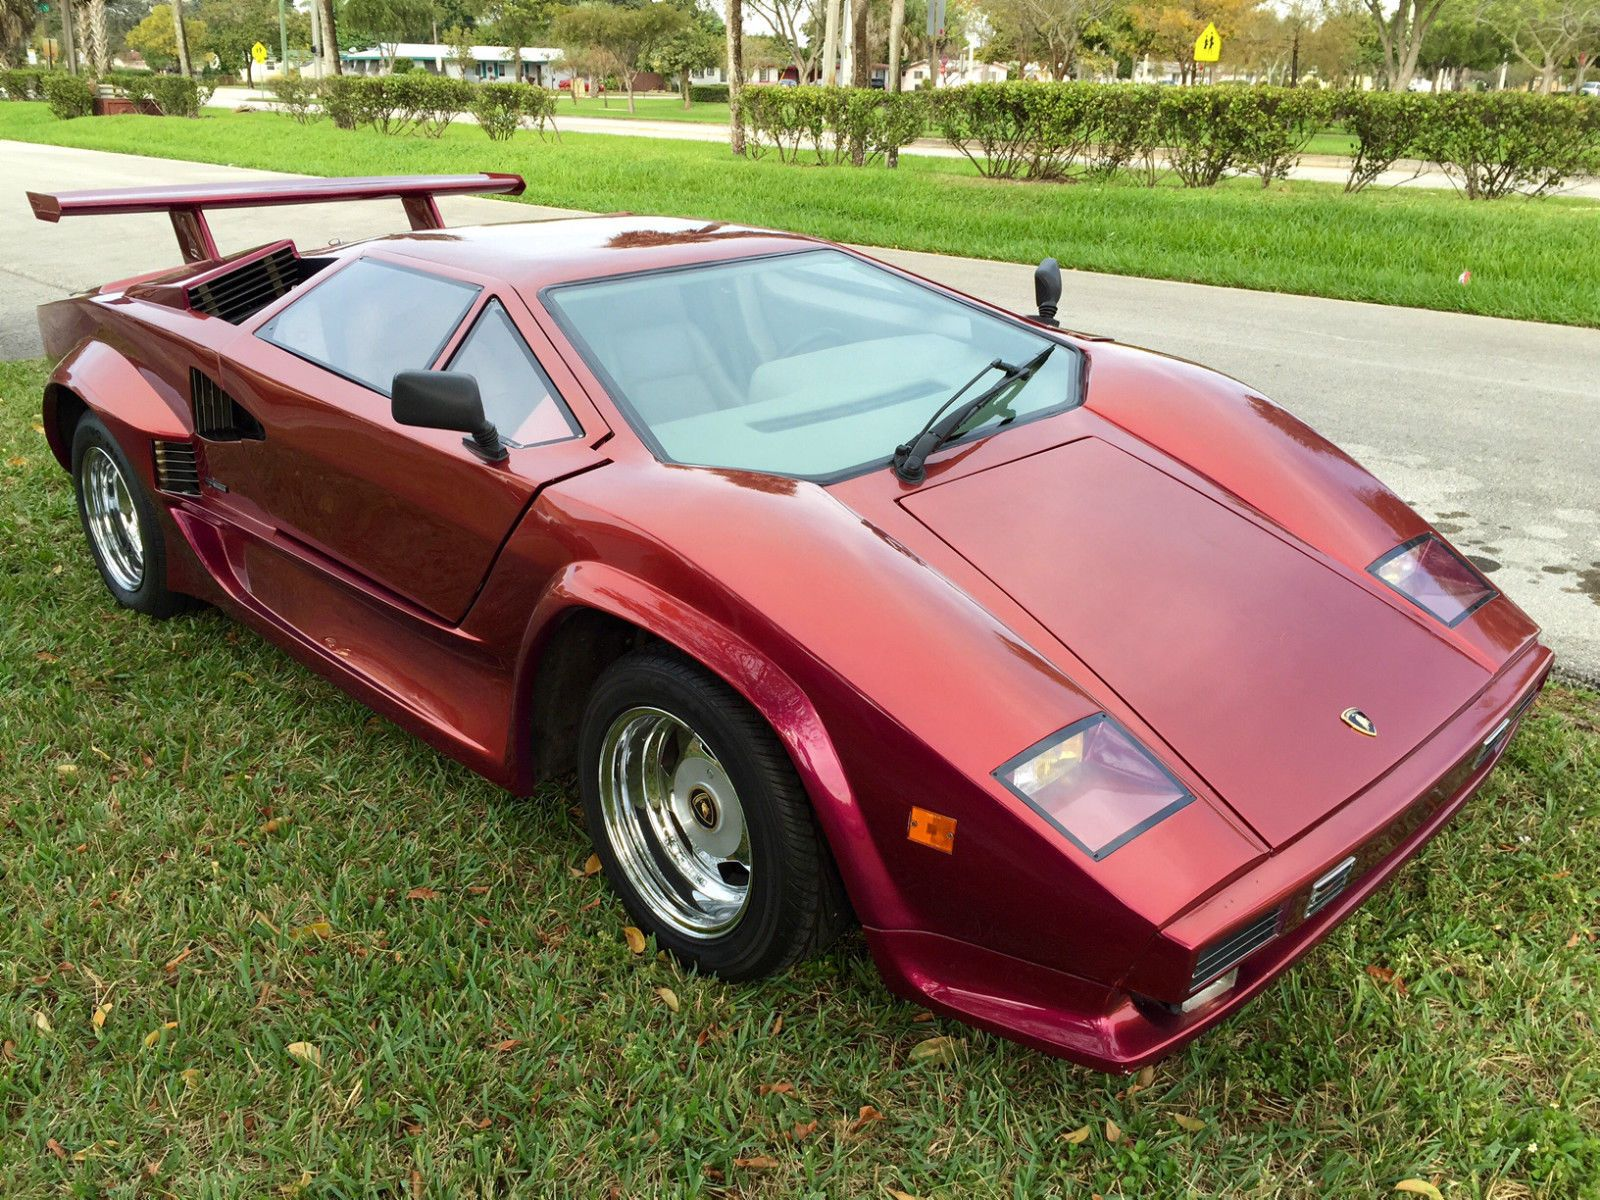 b0a84a20fe0dc512a21aec7481dfab9f Astounding Lamborghini Countach Built In Basement Cars Trend